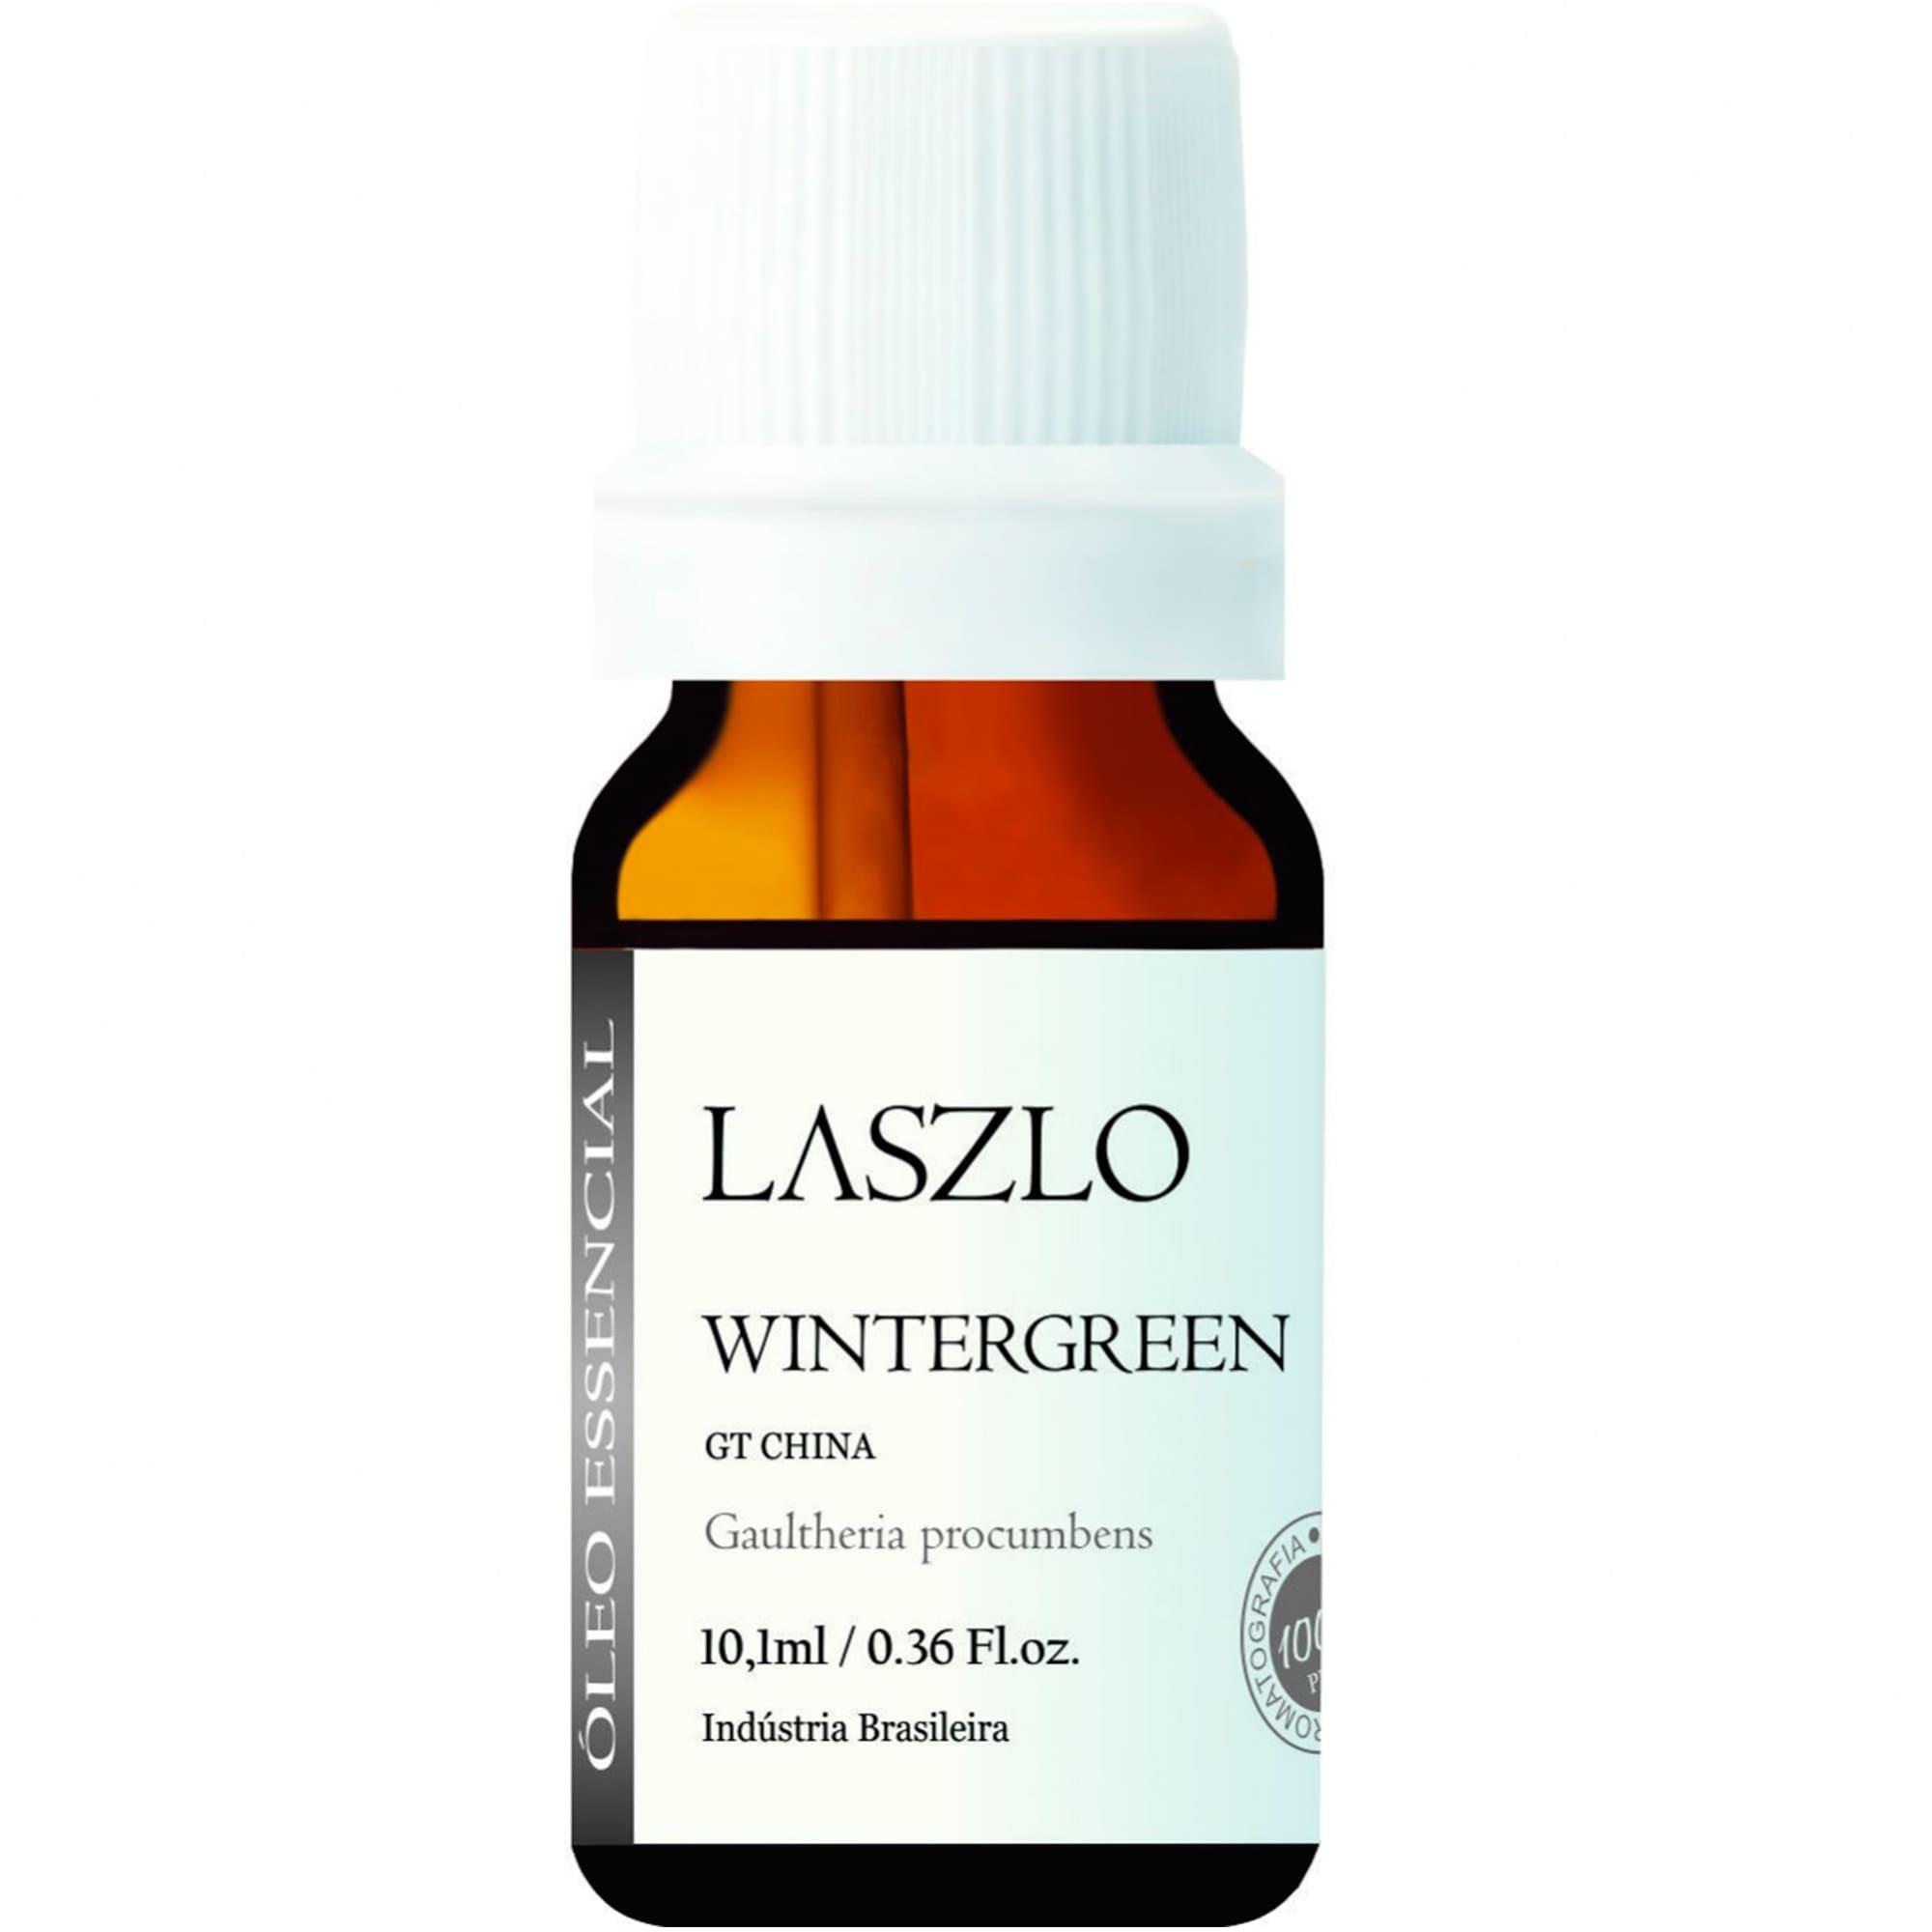 Óleo Essencial de Wintergreen (GT China) 10,1ml - Laszlo